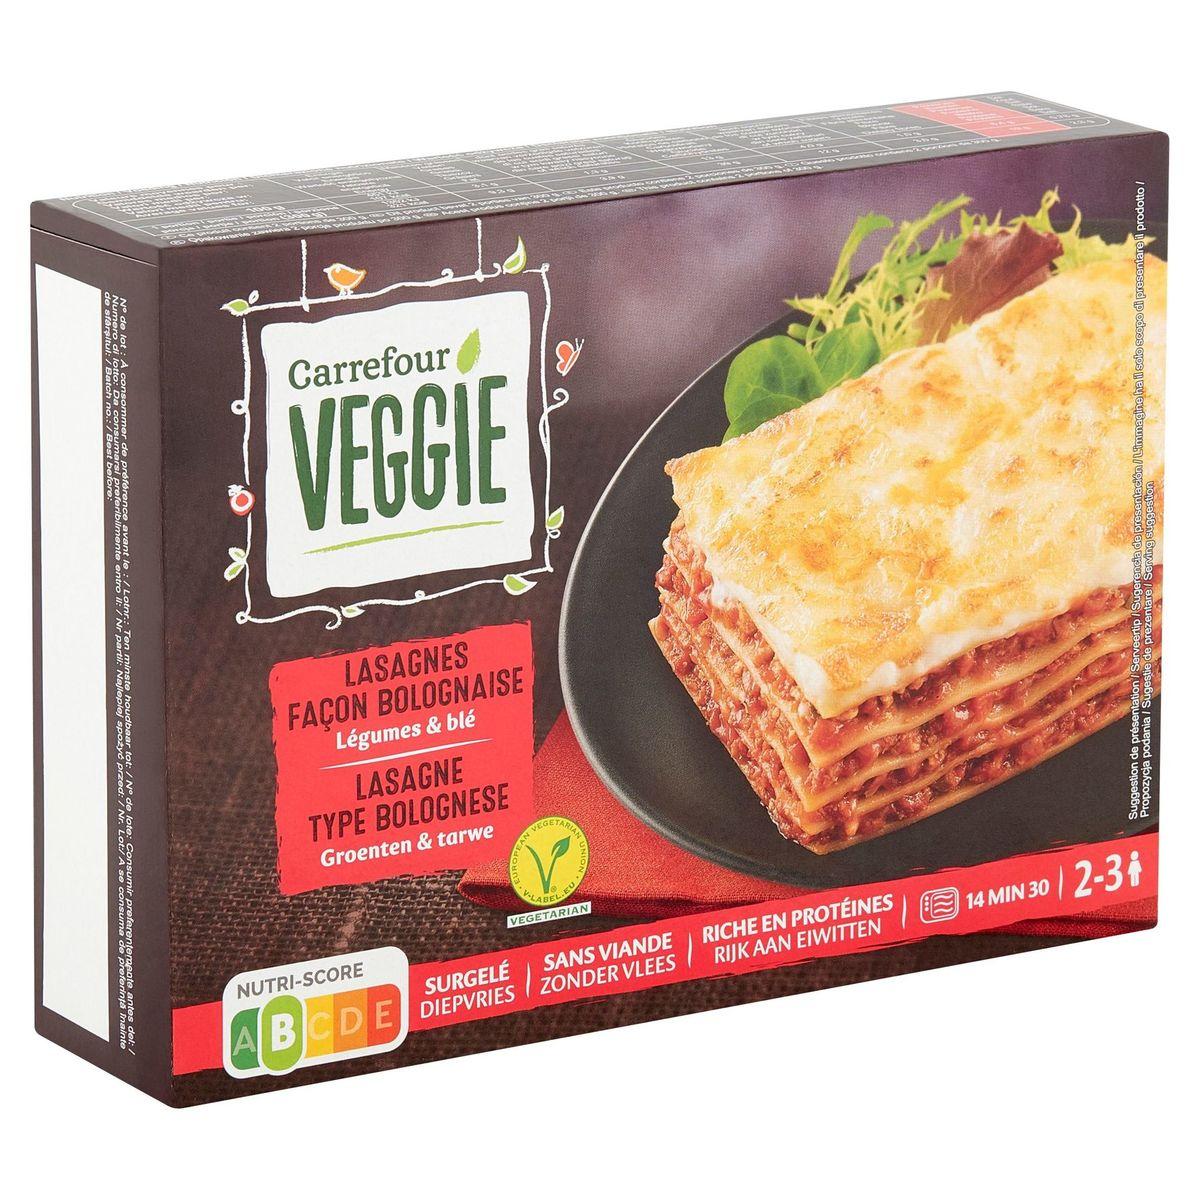 Carrefour Veggie Lasagne Type Bolognese Groenten & Tarwe 600 g